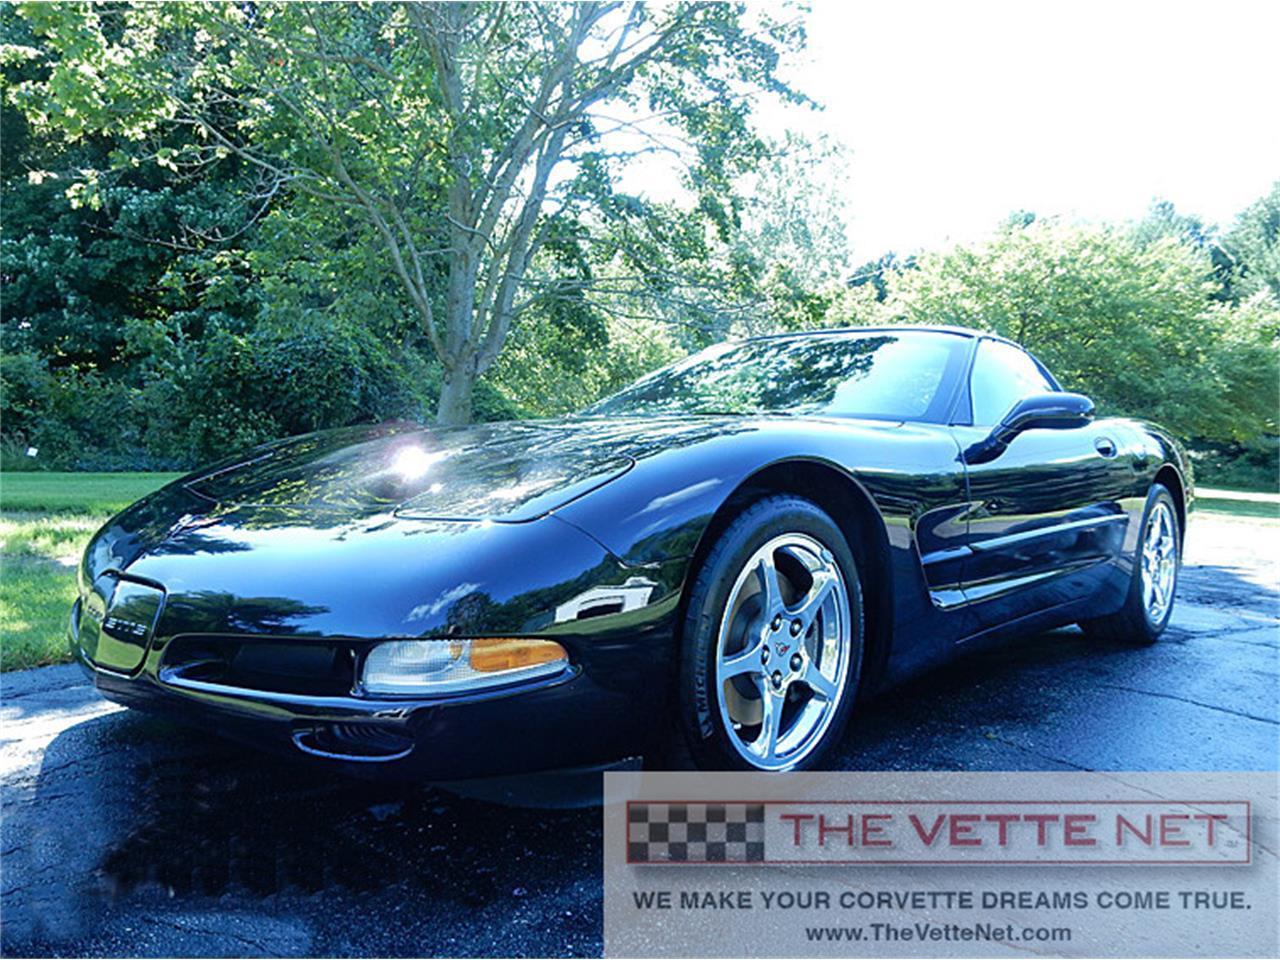 2004 Chevrolet Corvette (CC-1164387) for sale in Sarasota, Florida